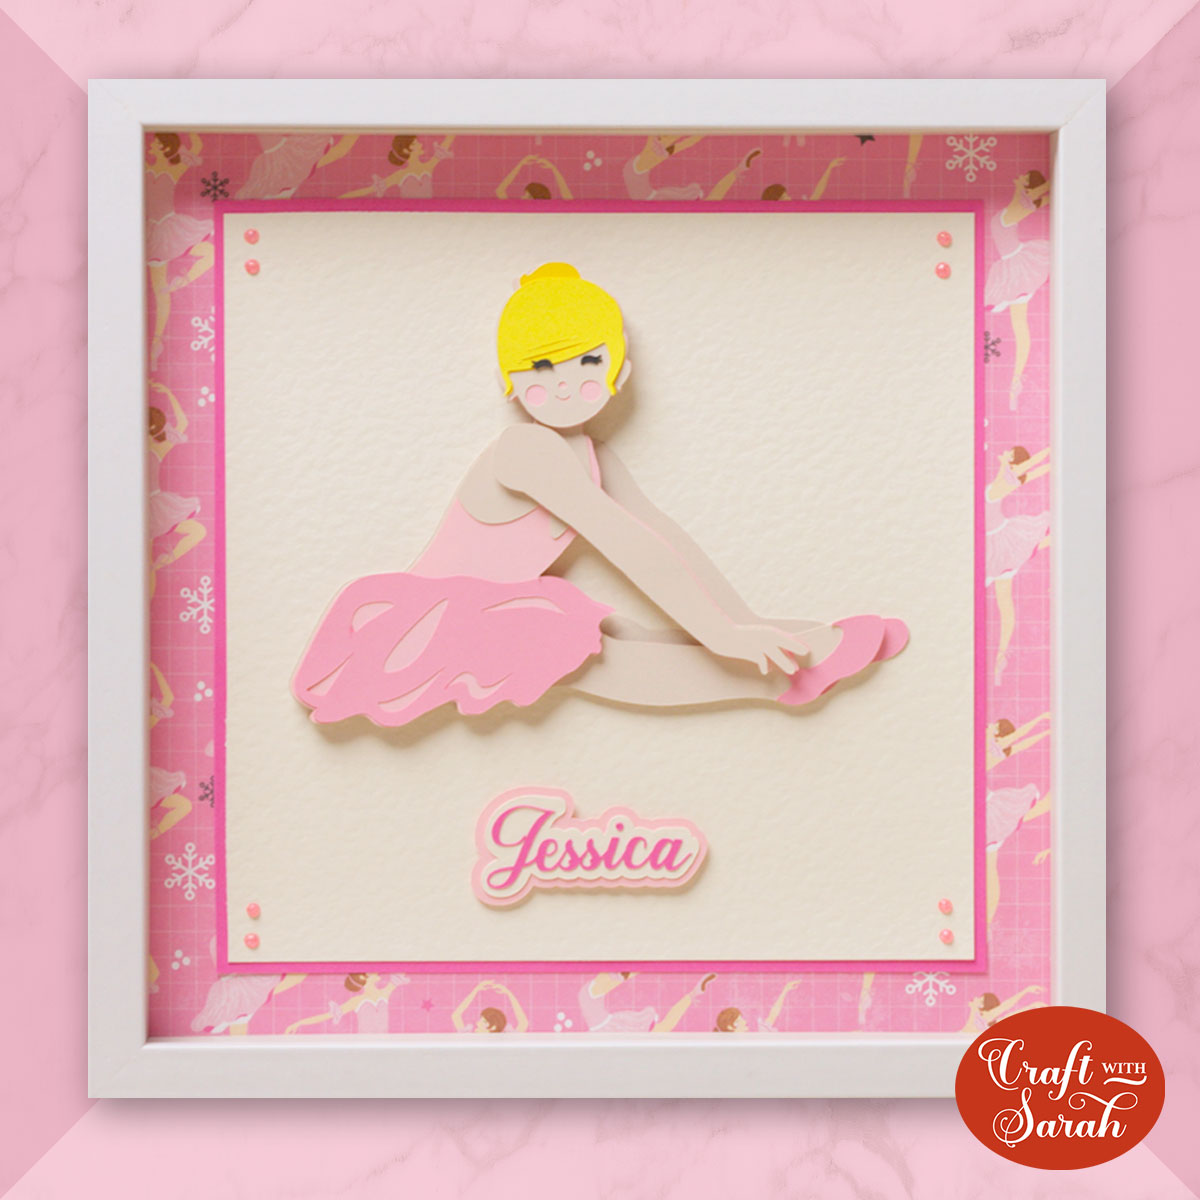 Layered ballerina SVG in shadow box frame